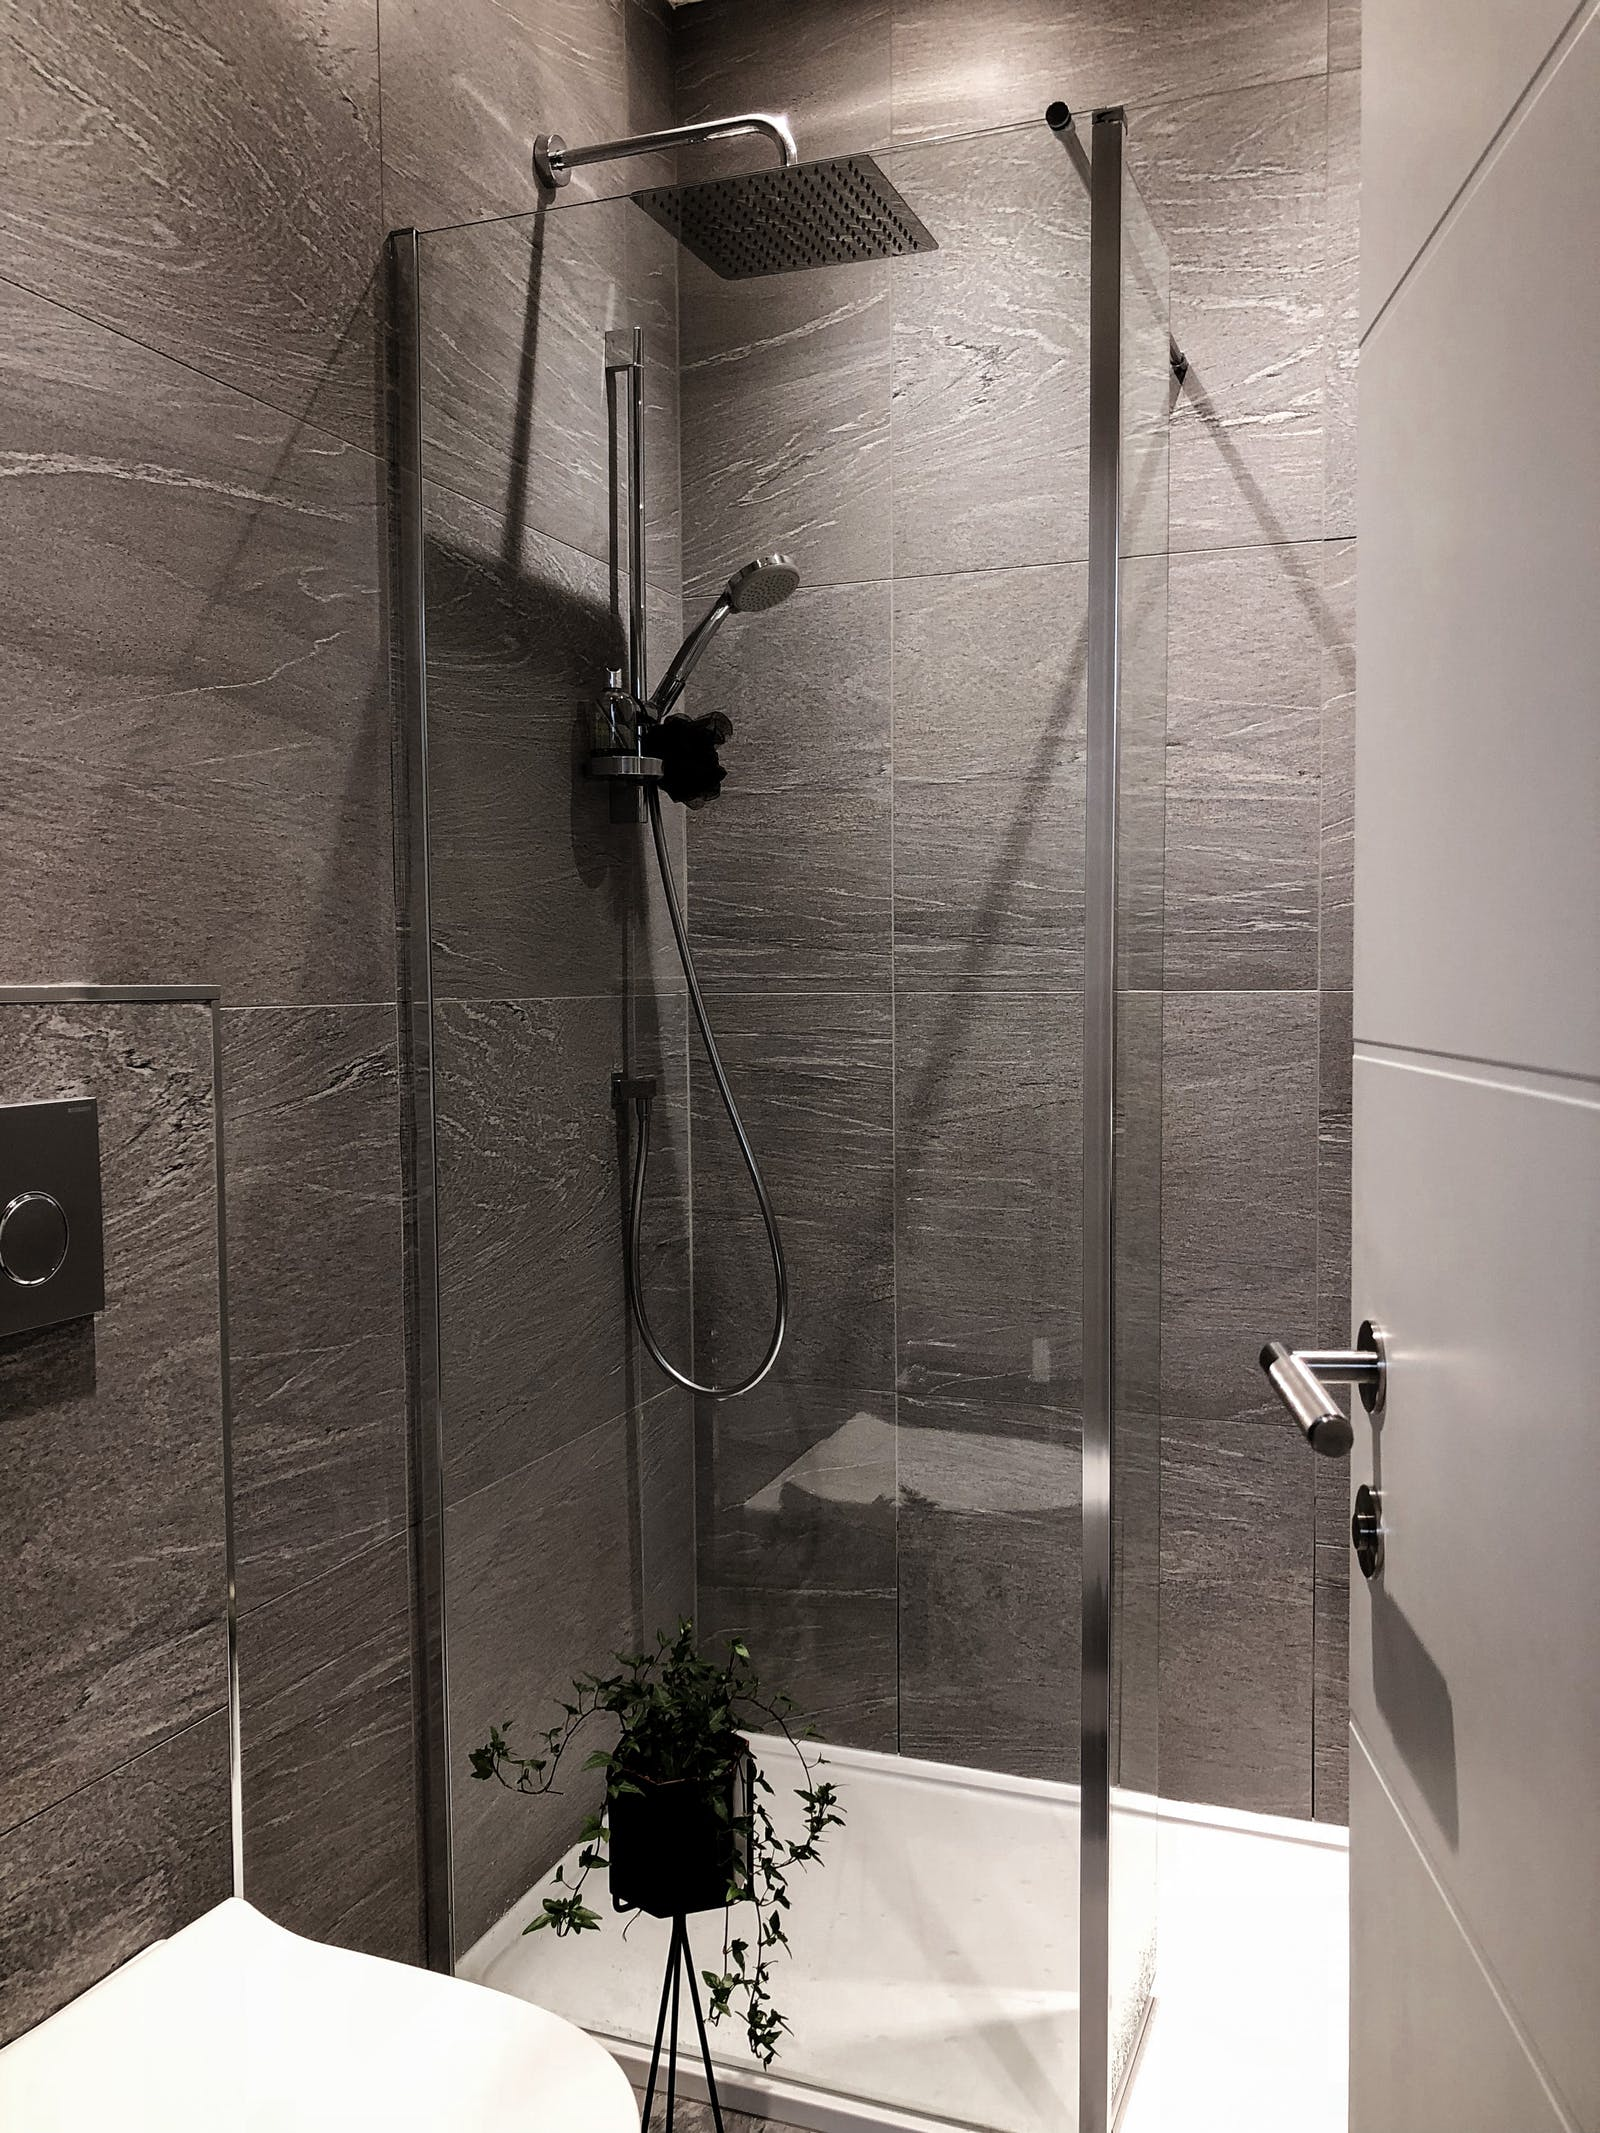 Shower area in grey